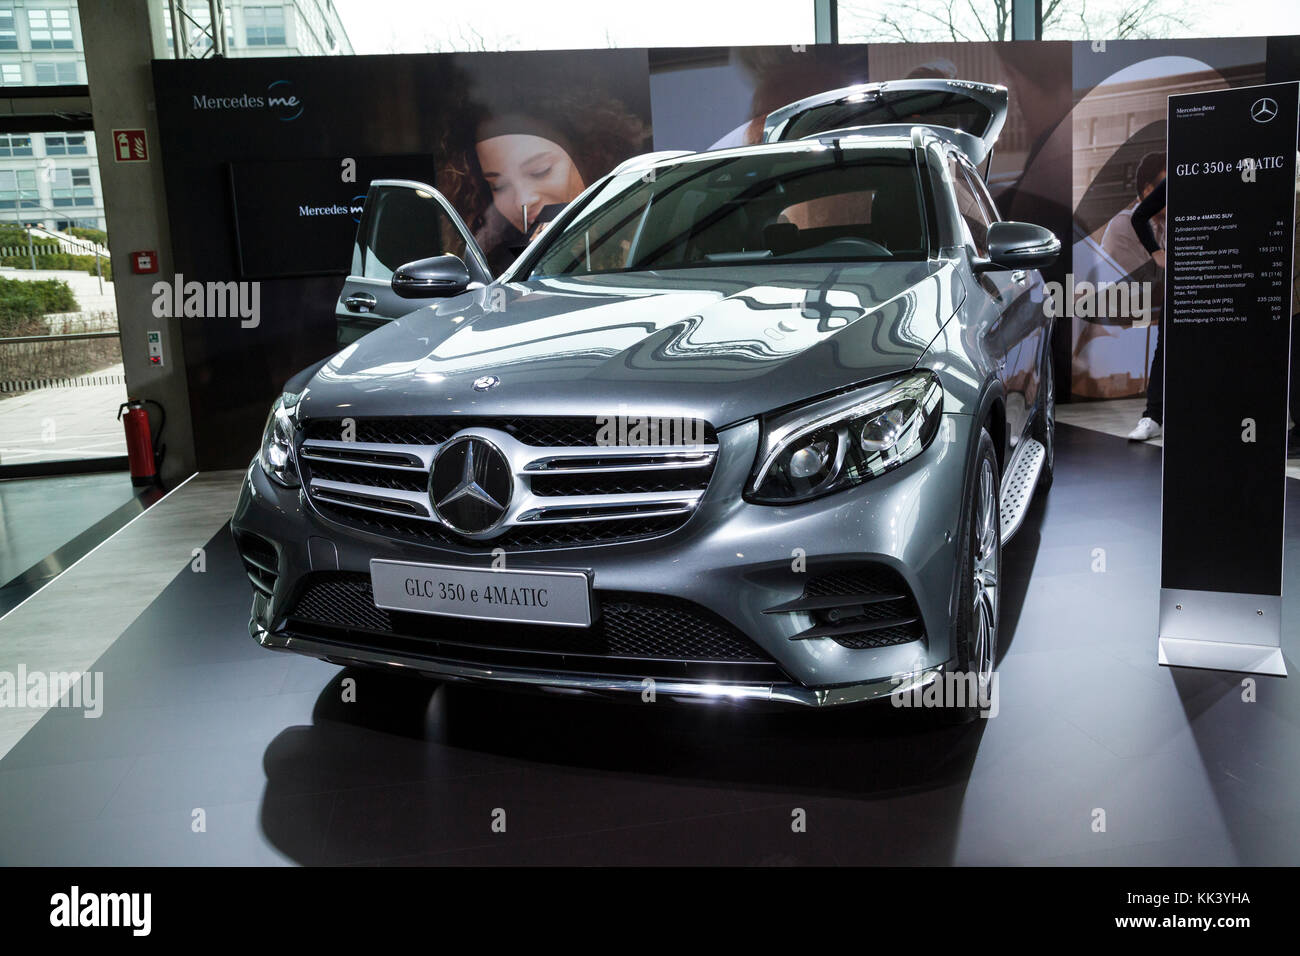 Mercedes Benz GLC 350 E 4MATIC Stockbild